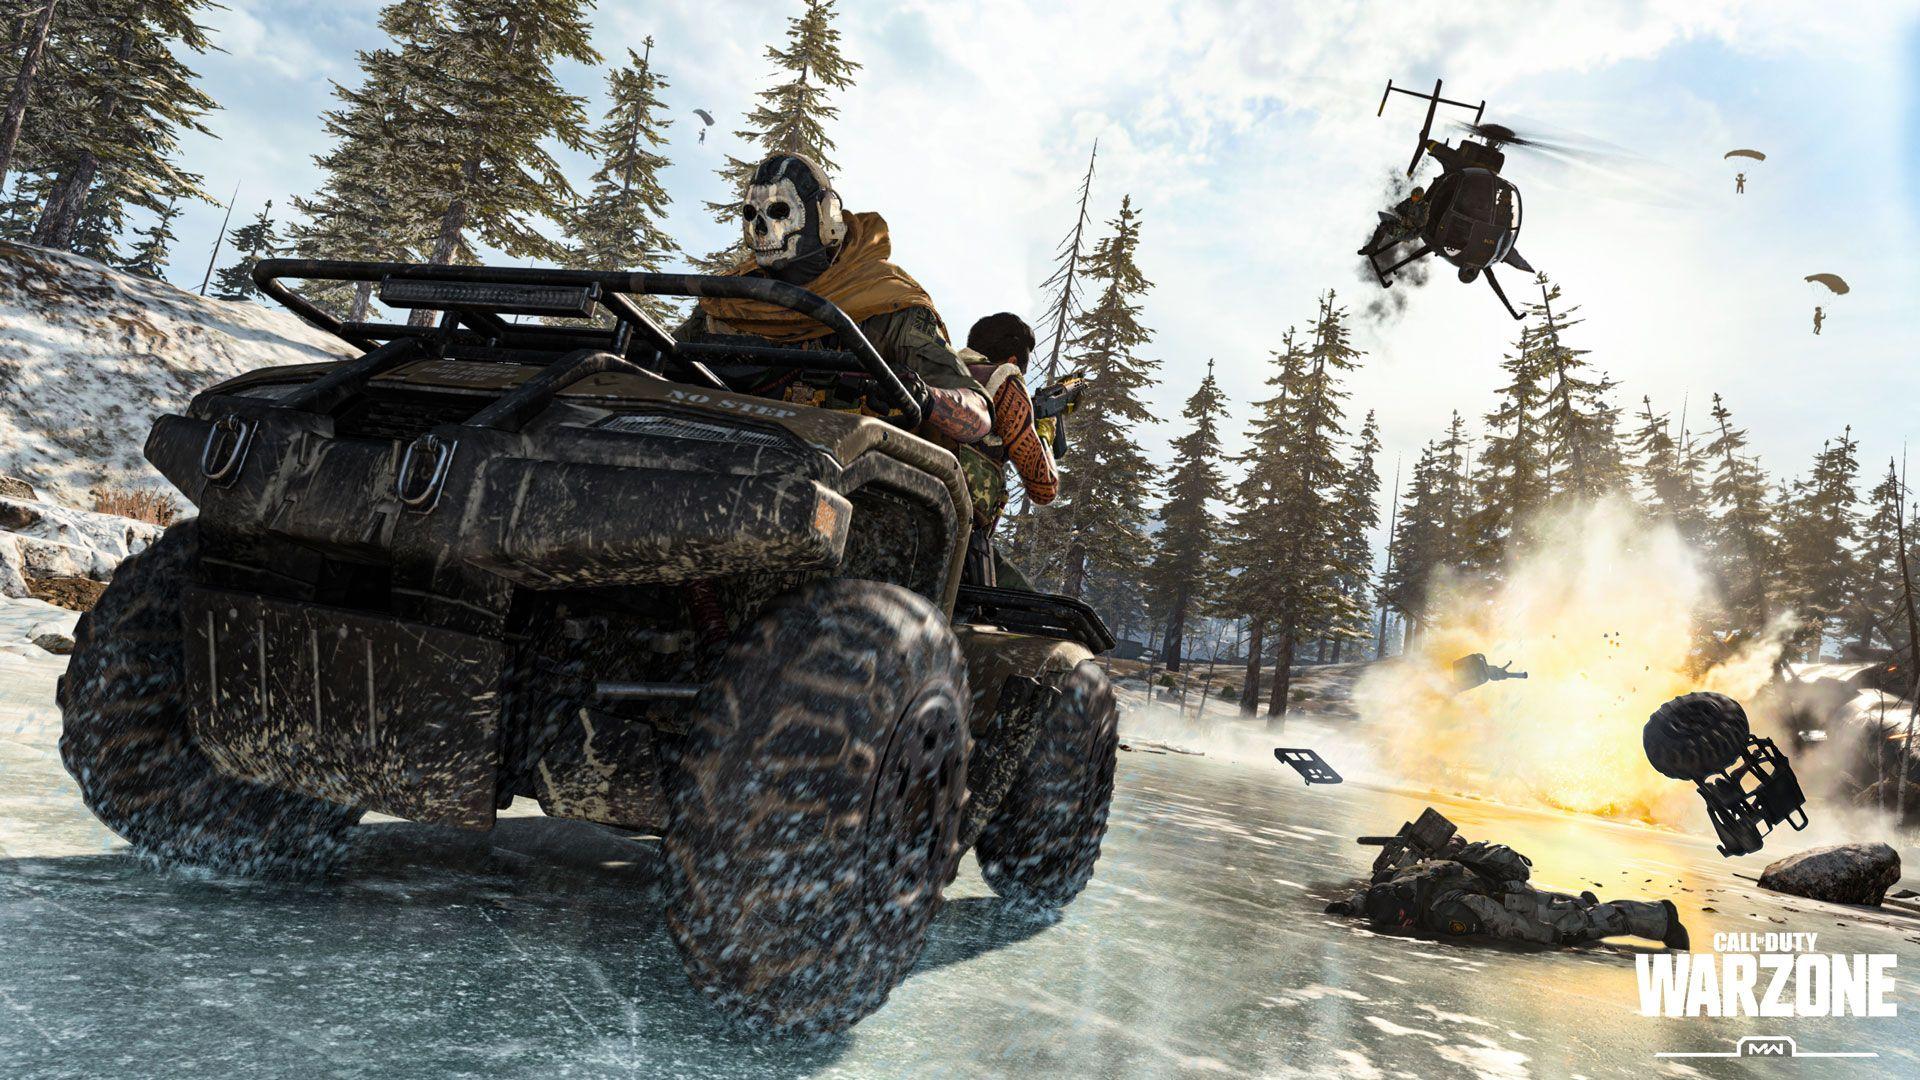 Call-of-Duty-Warzone-1.jpg